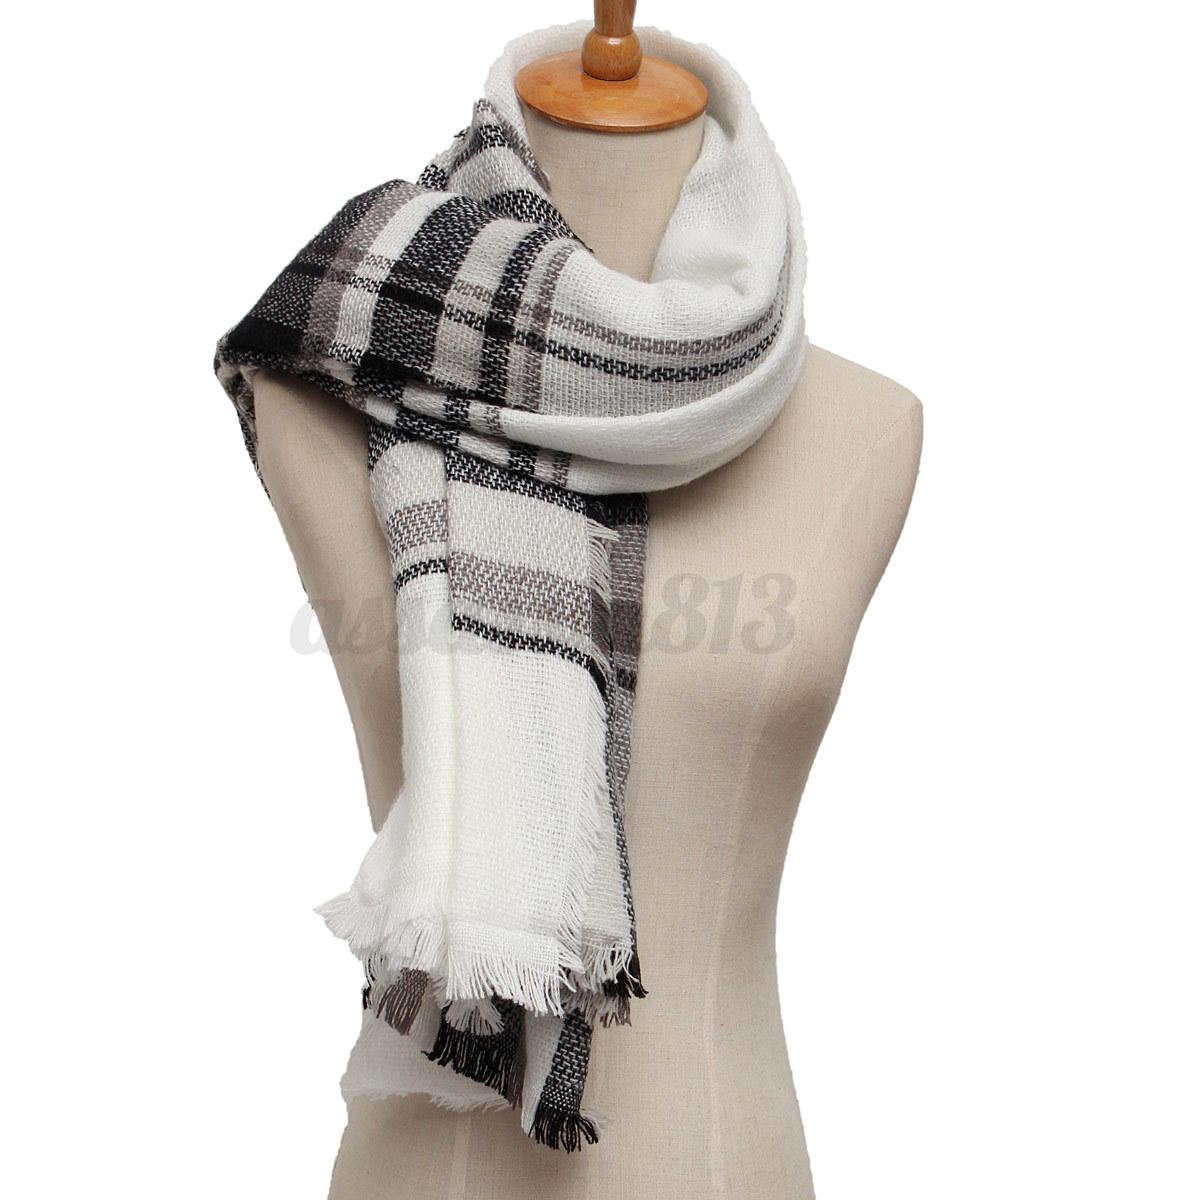 Knitting Pattern Tartan Scarf : Woman Lady Scarf Shawl Long Scarves Tiles Scottish Tartan Wool Cashmere Knitt...